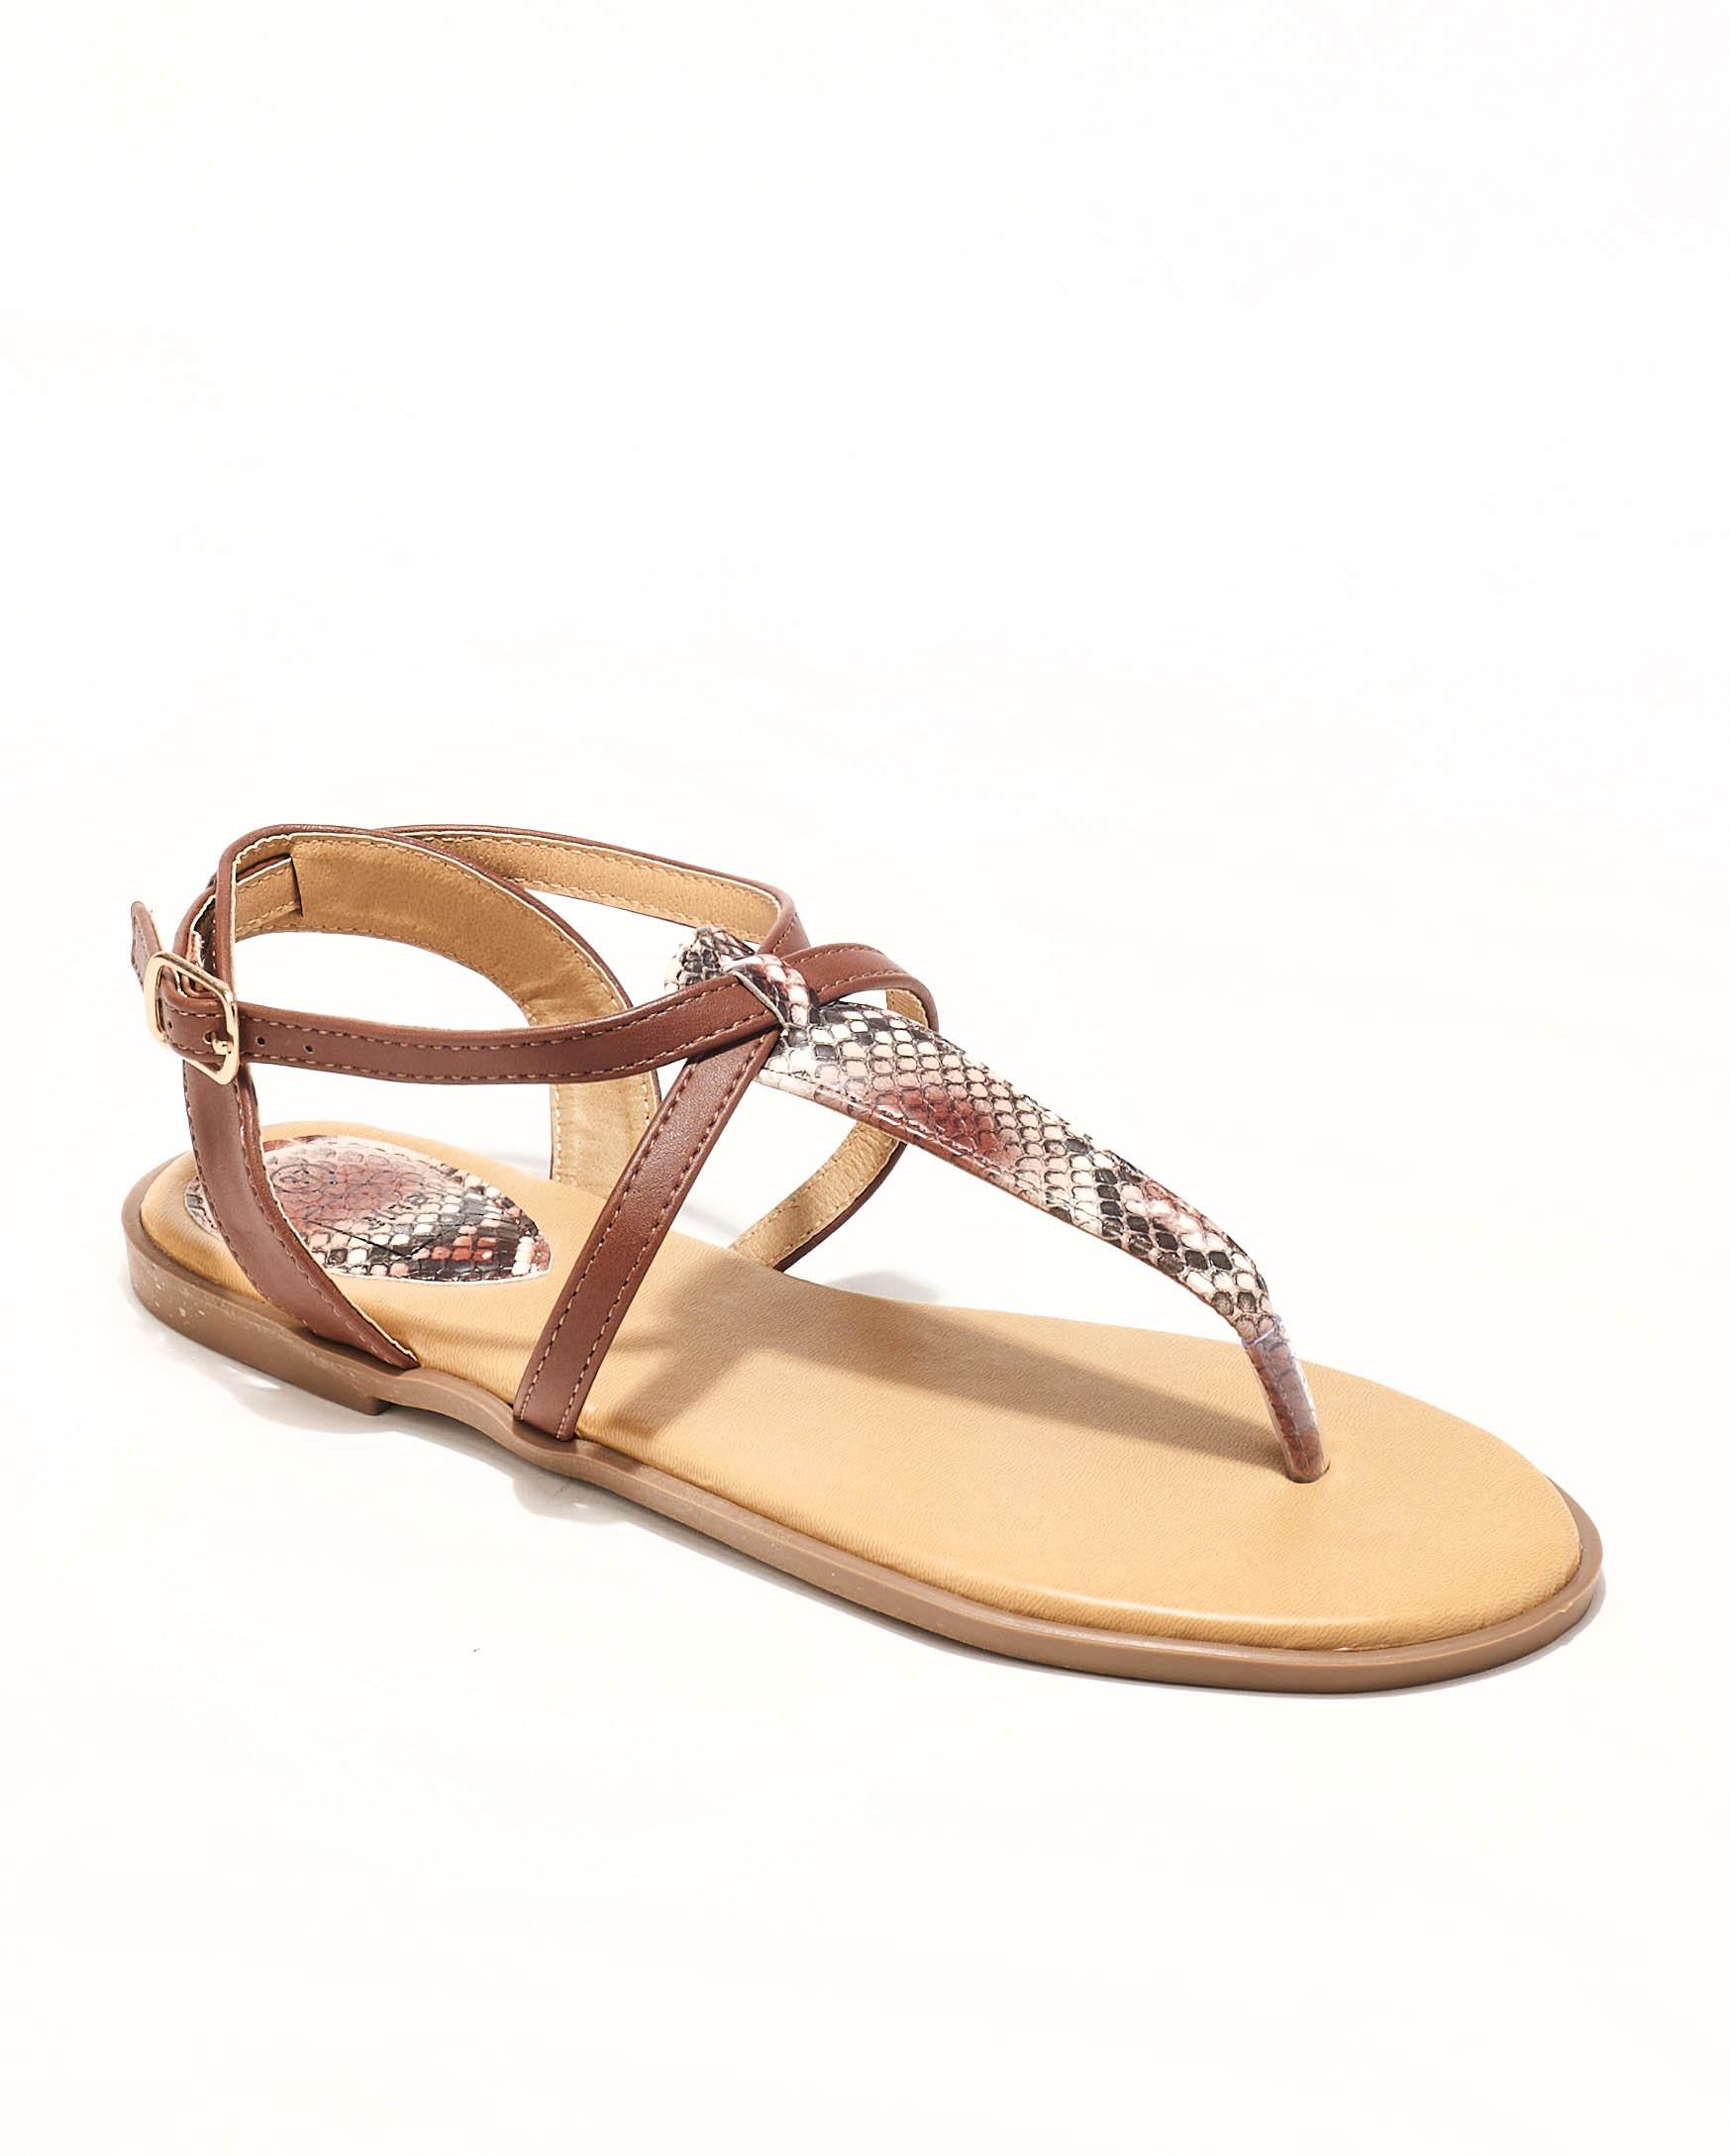 Sandales Plates Femme - Sandale Plate Python Marron Jina - Style 1 Zh P06